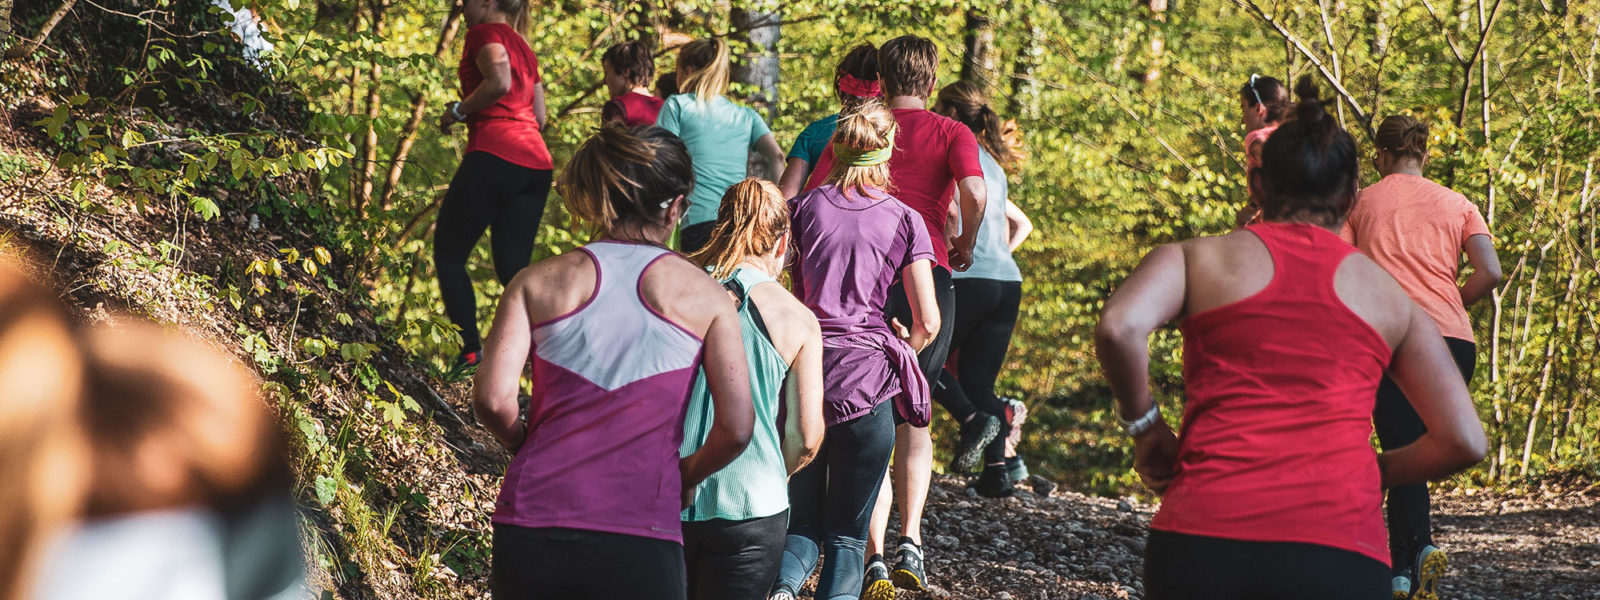 Girls-on-Trails-trailrunning-workshop